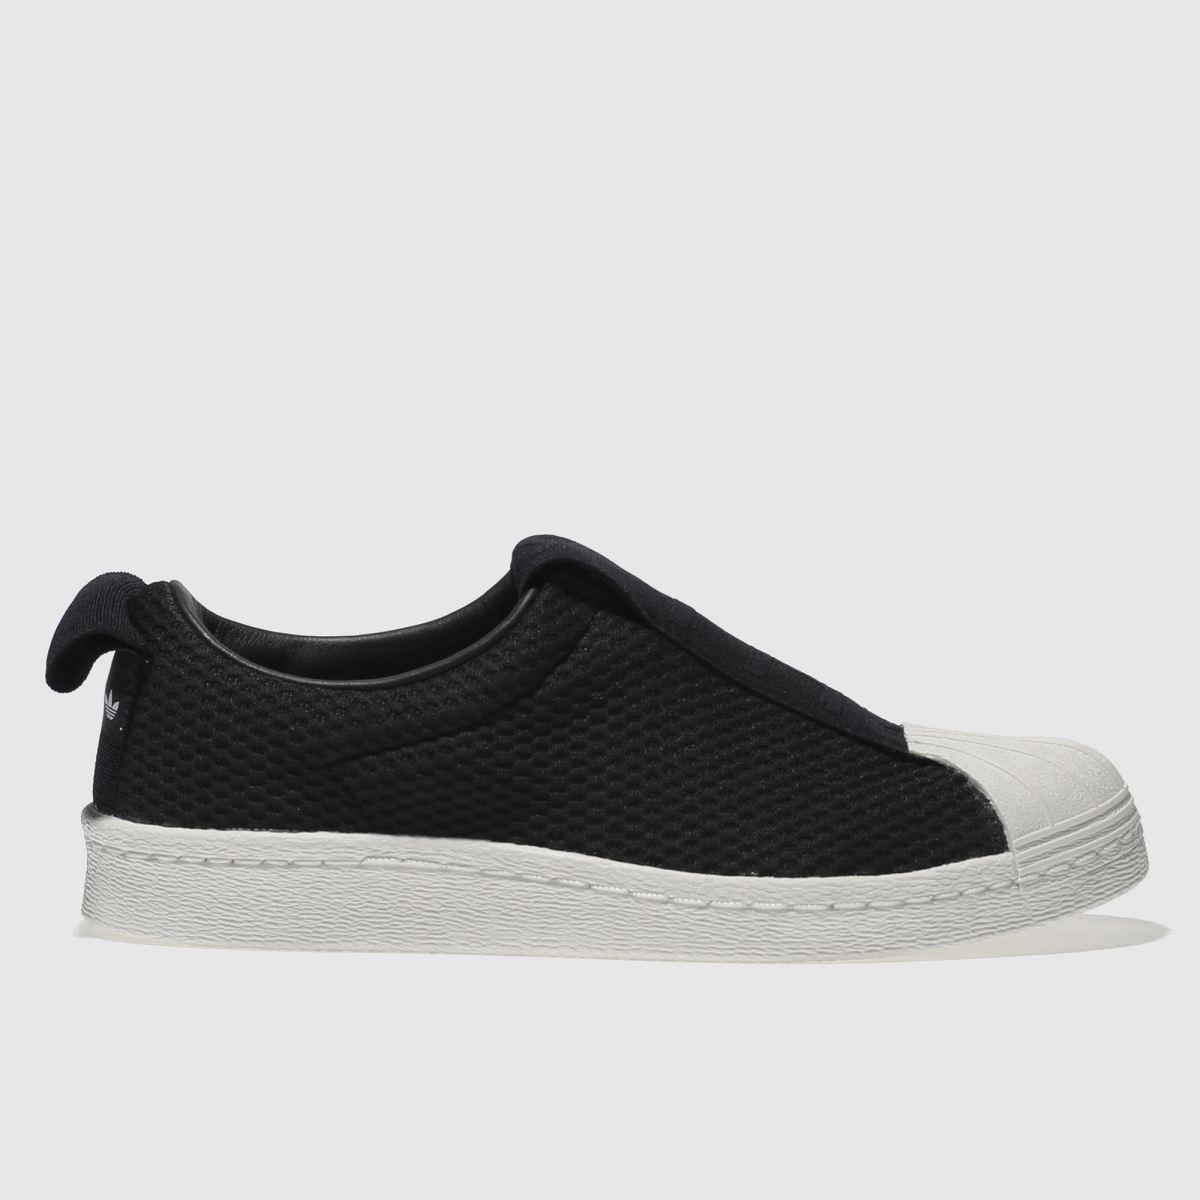 adidas black & white superstar bw35 slip-on trainers